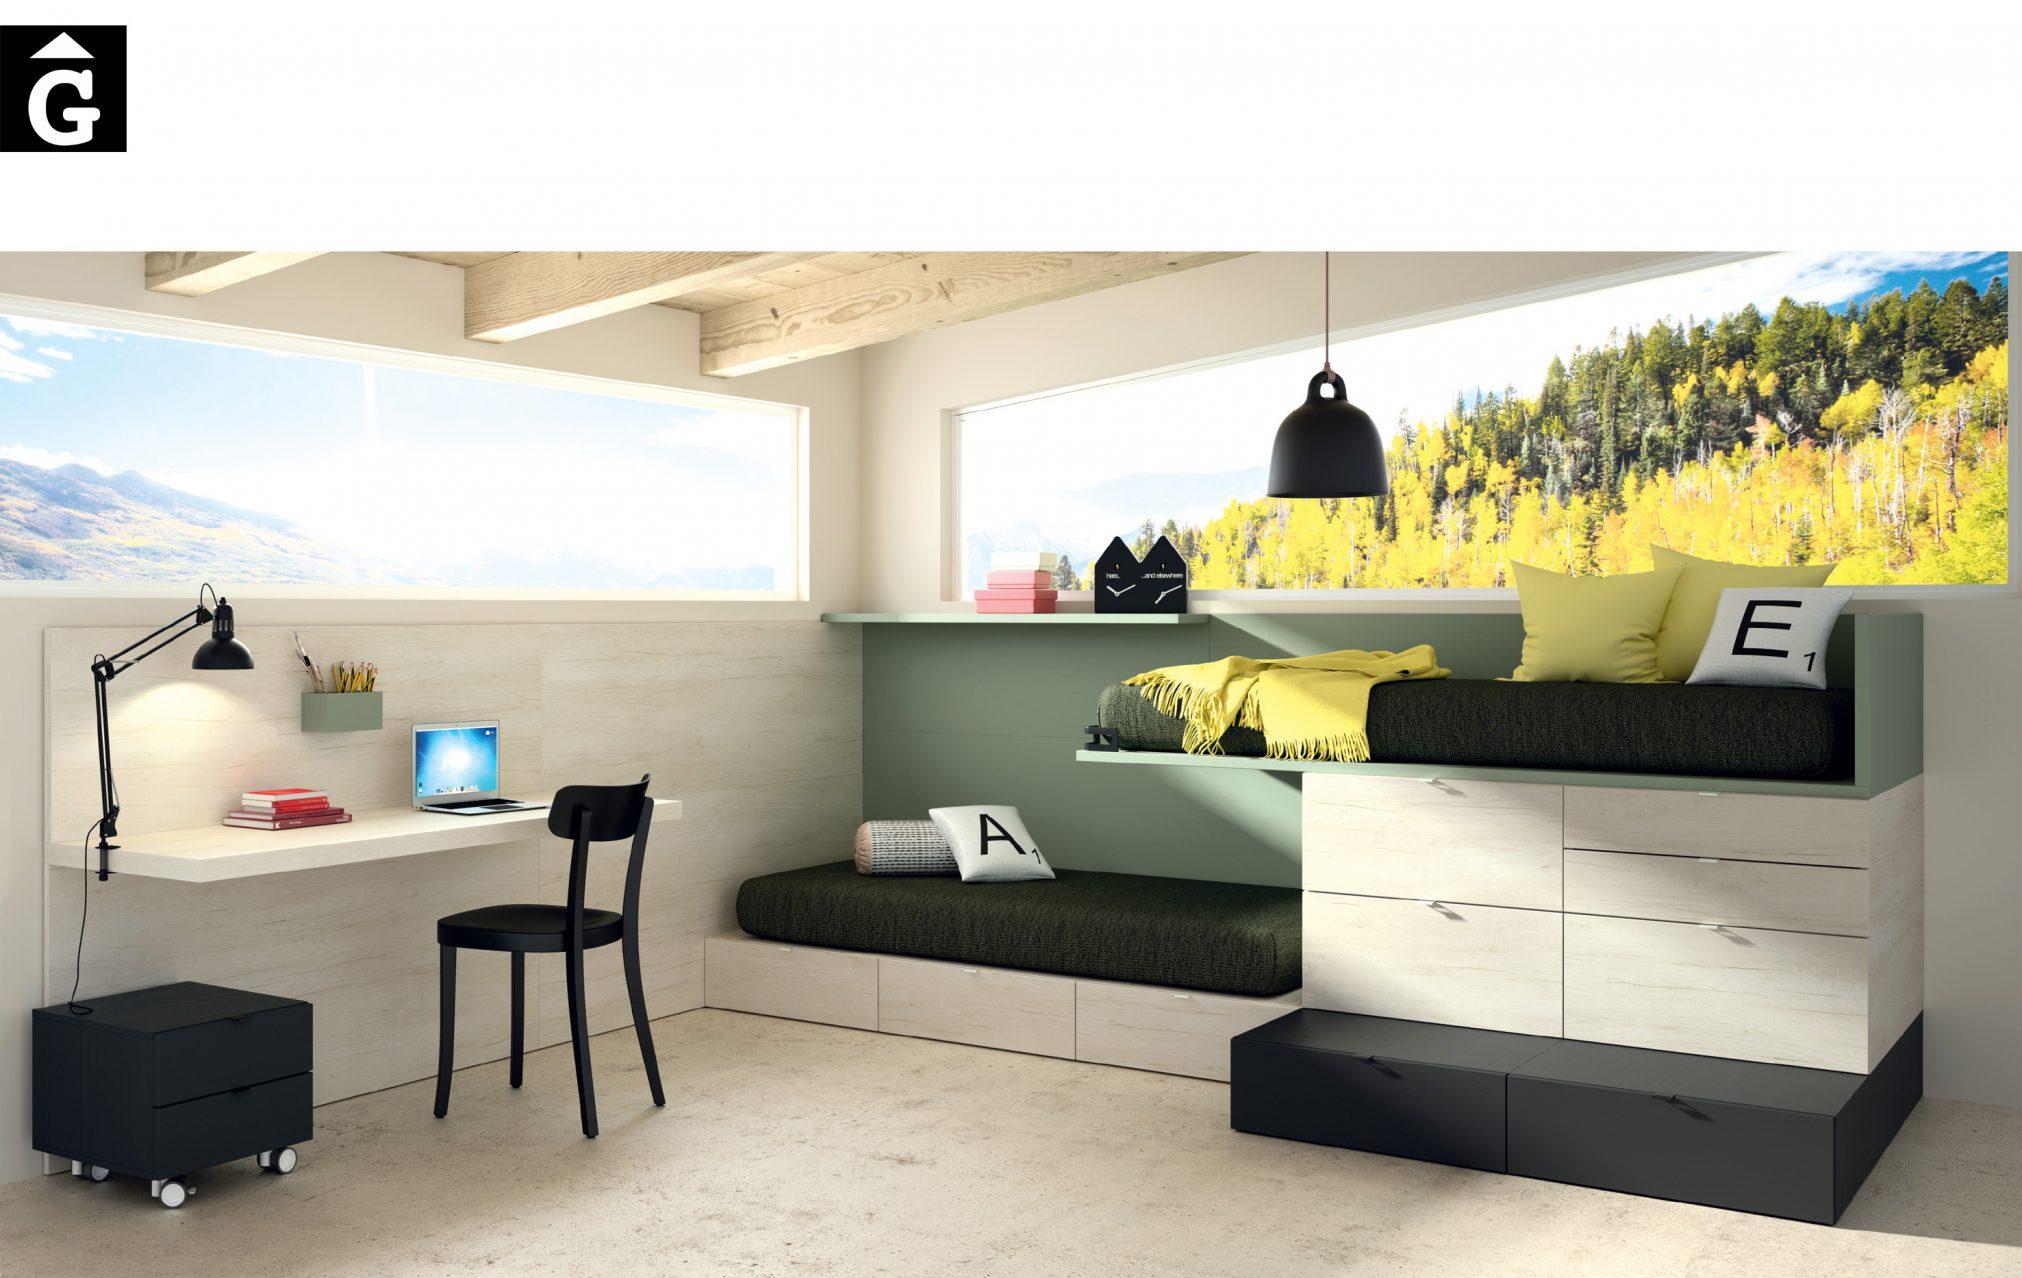 Lagrama Montreal habitacions juvenils by mobles Gifreu Porqueres Girona-Recovered